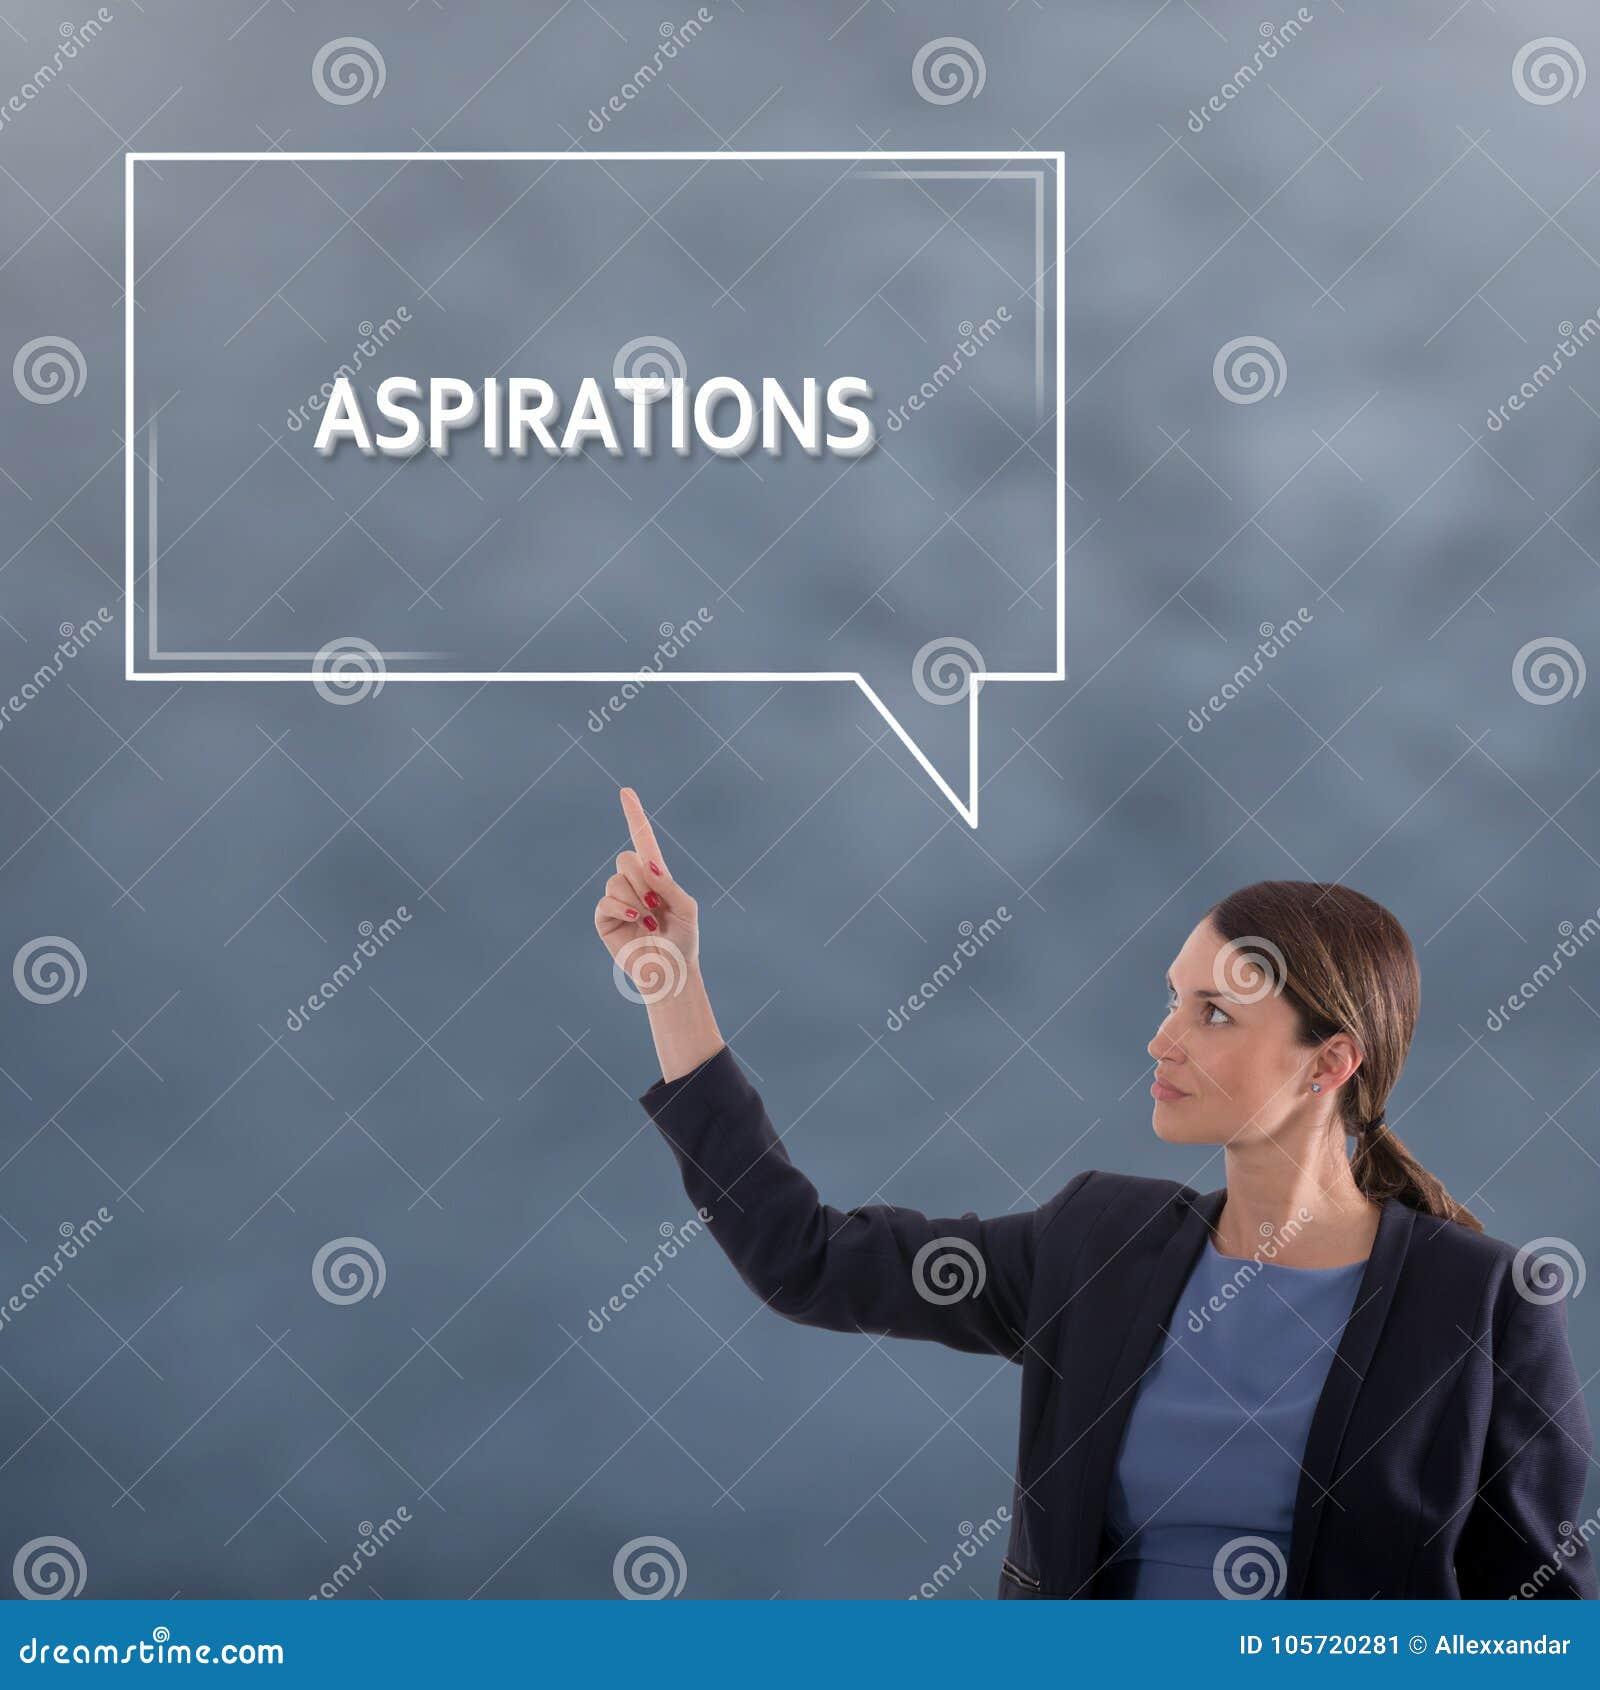 ASPIRATIONS CONCEPT Business Concept. Business Woman